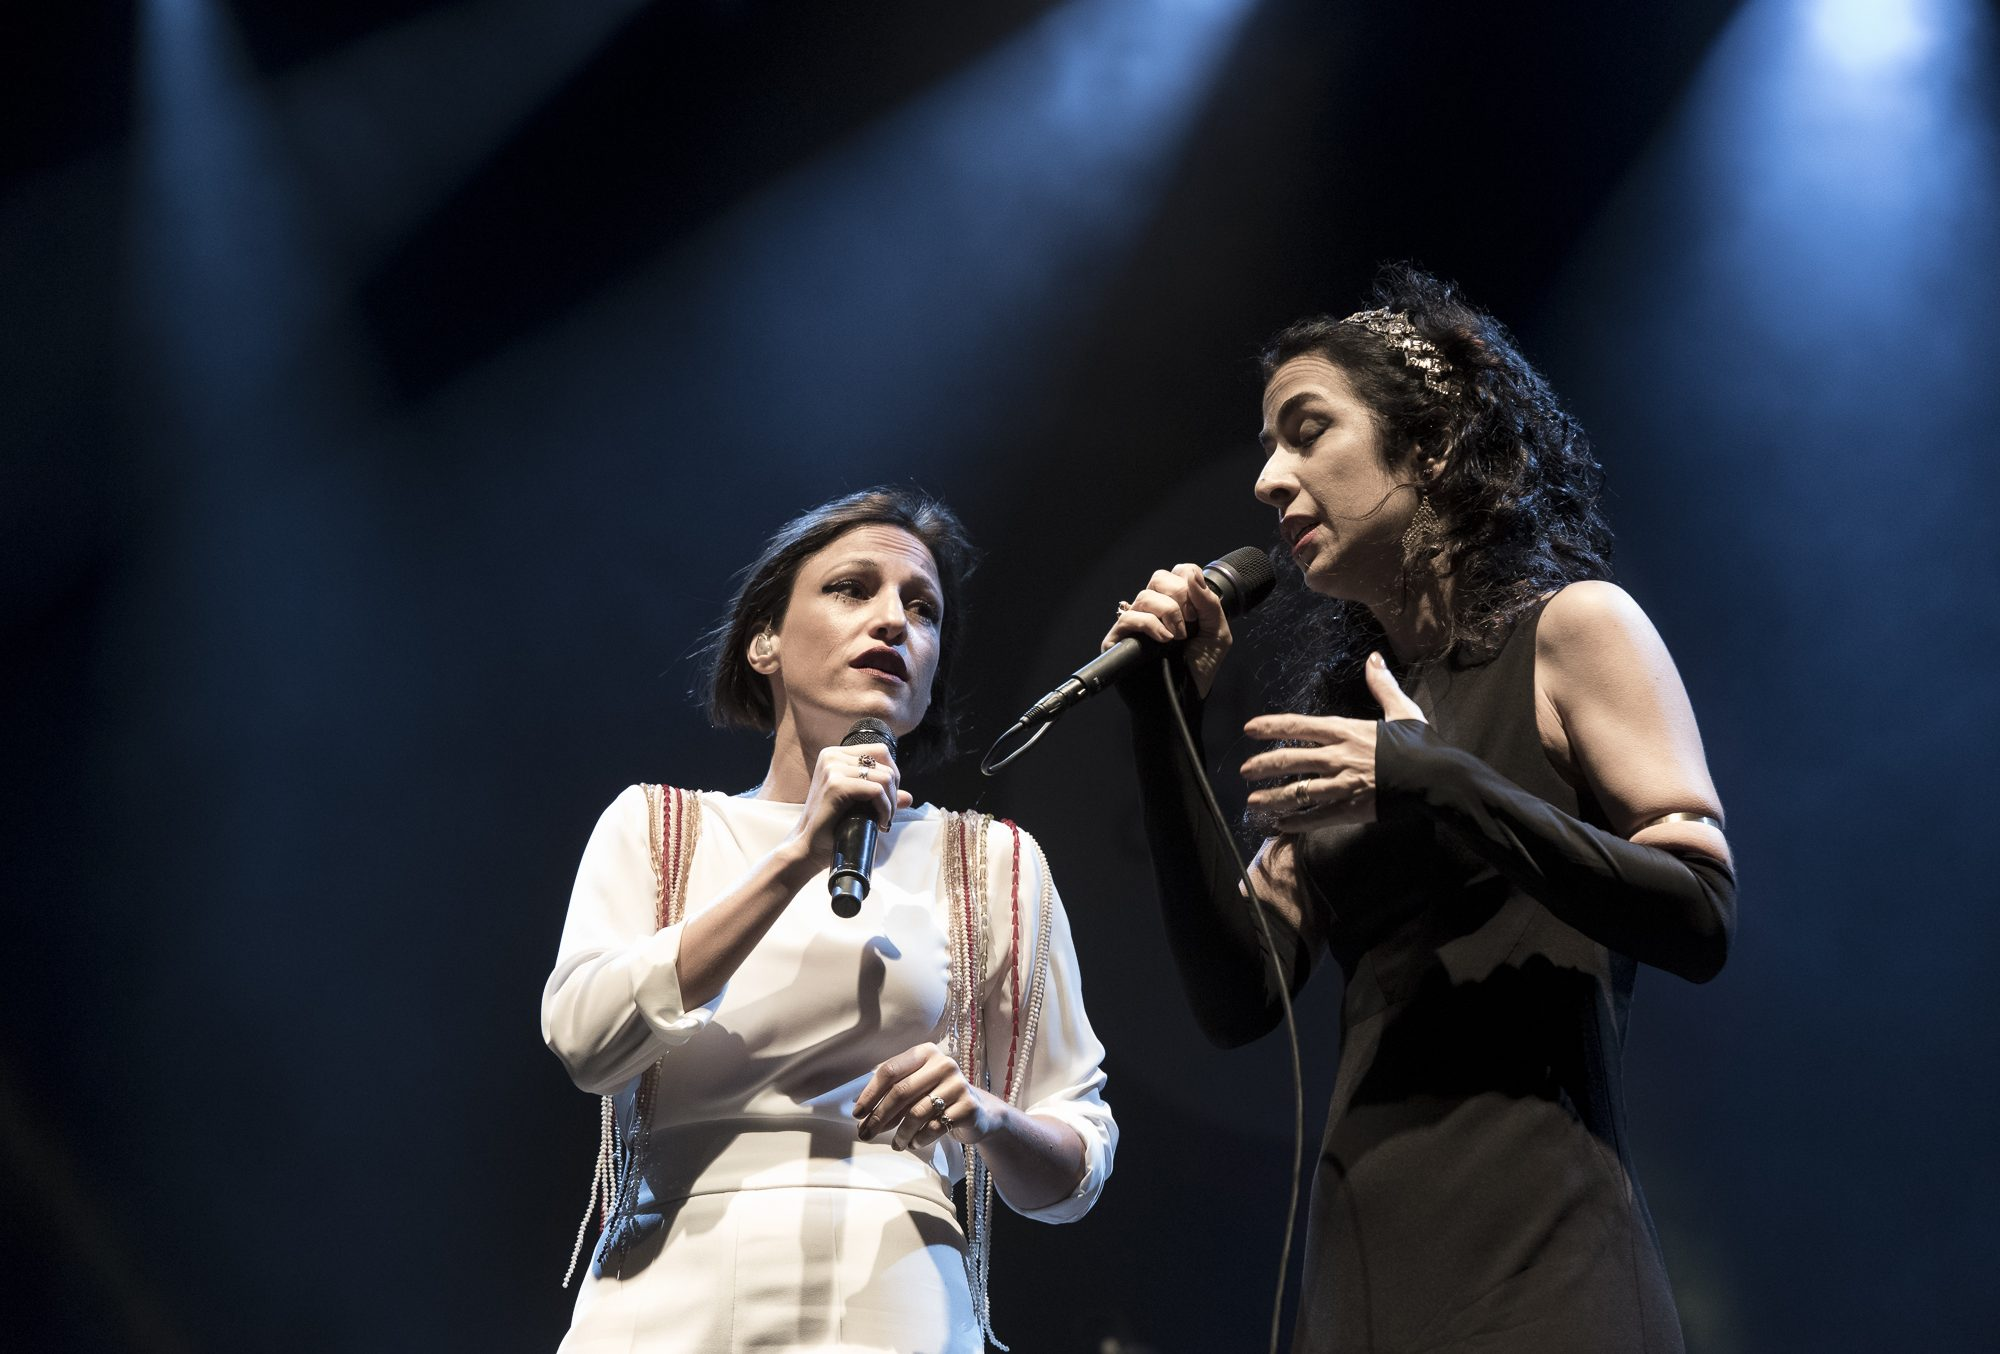 duetos luso-brasileiros carminho marisa monte